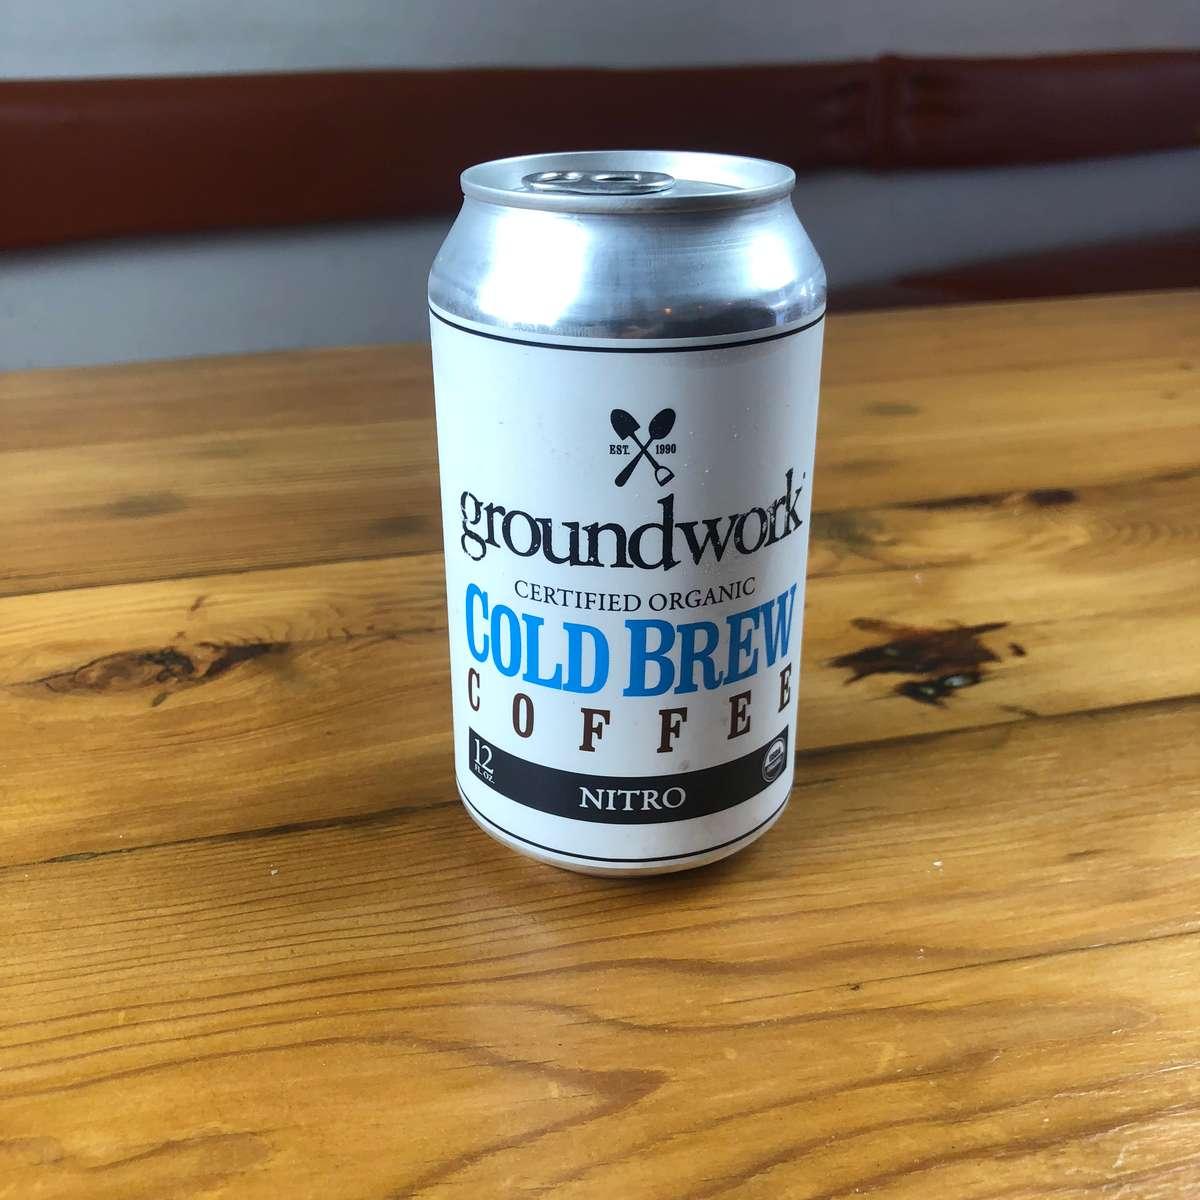 Groundworks Nitro Cold Brew